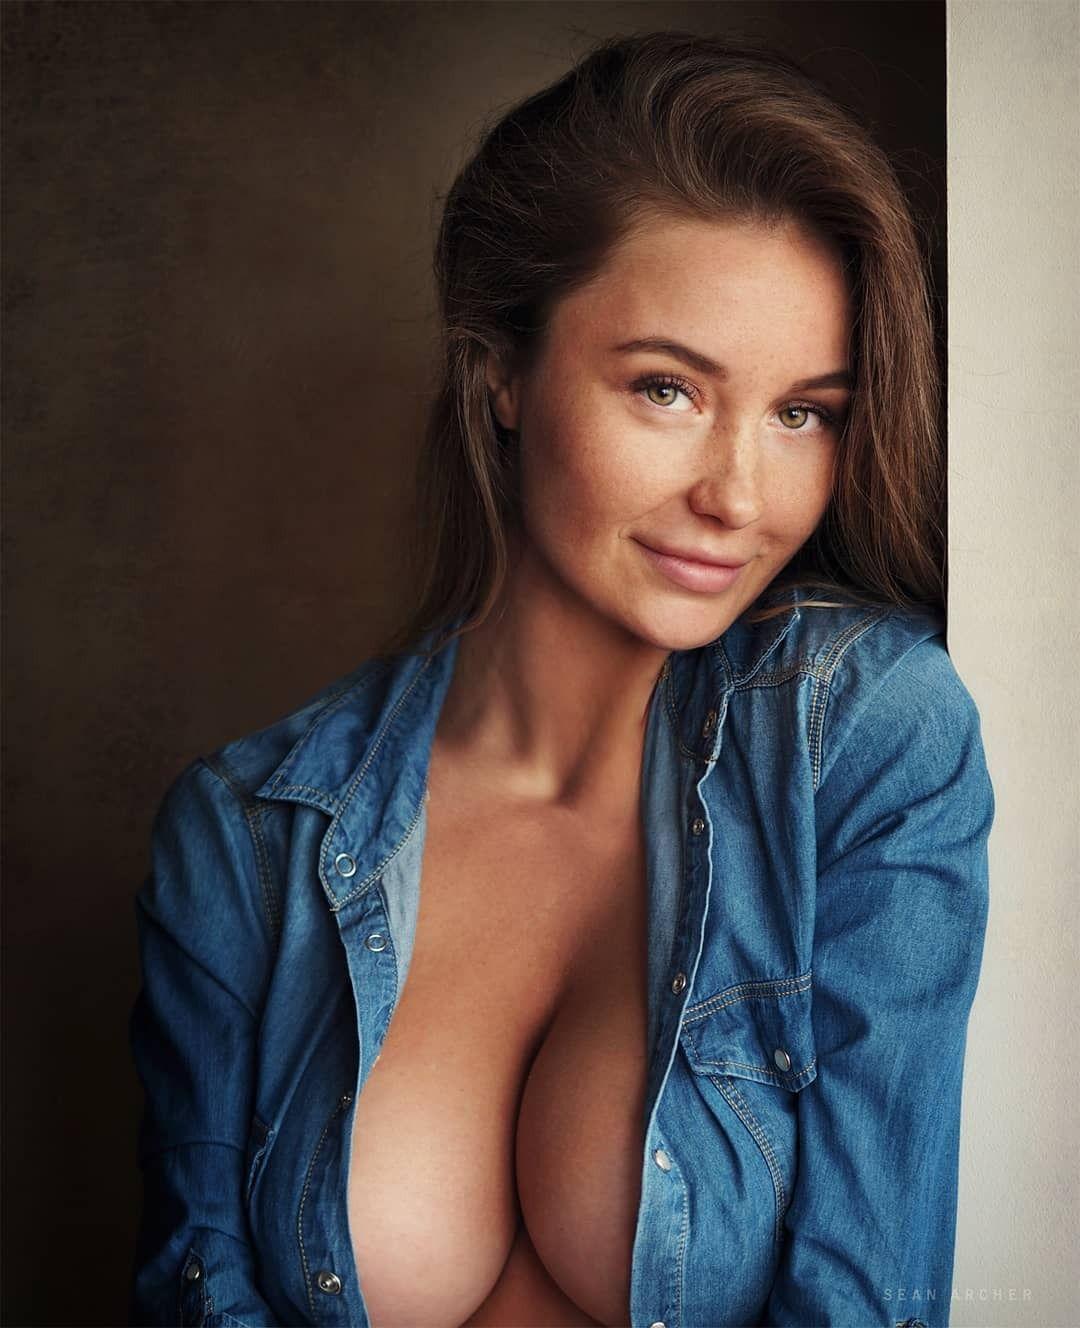 Cleavage Malgosia Bela naked (63 photos), Ass, Bikini, Boobs, butt 2015